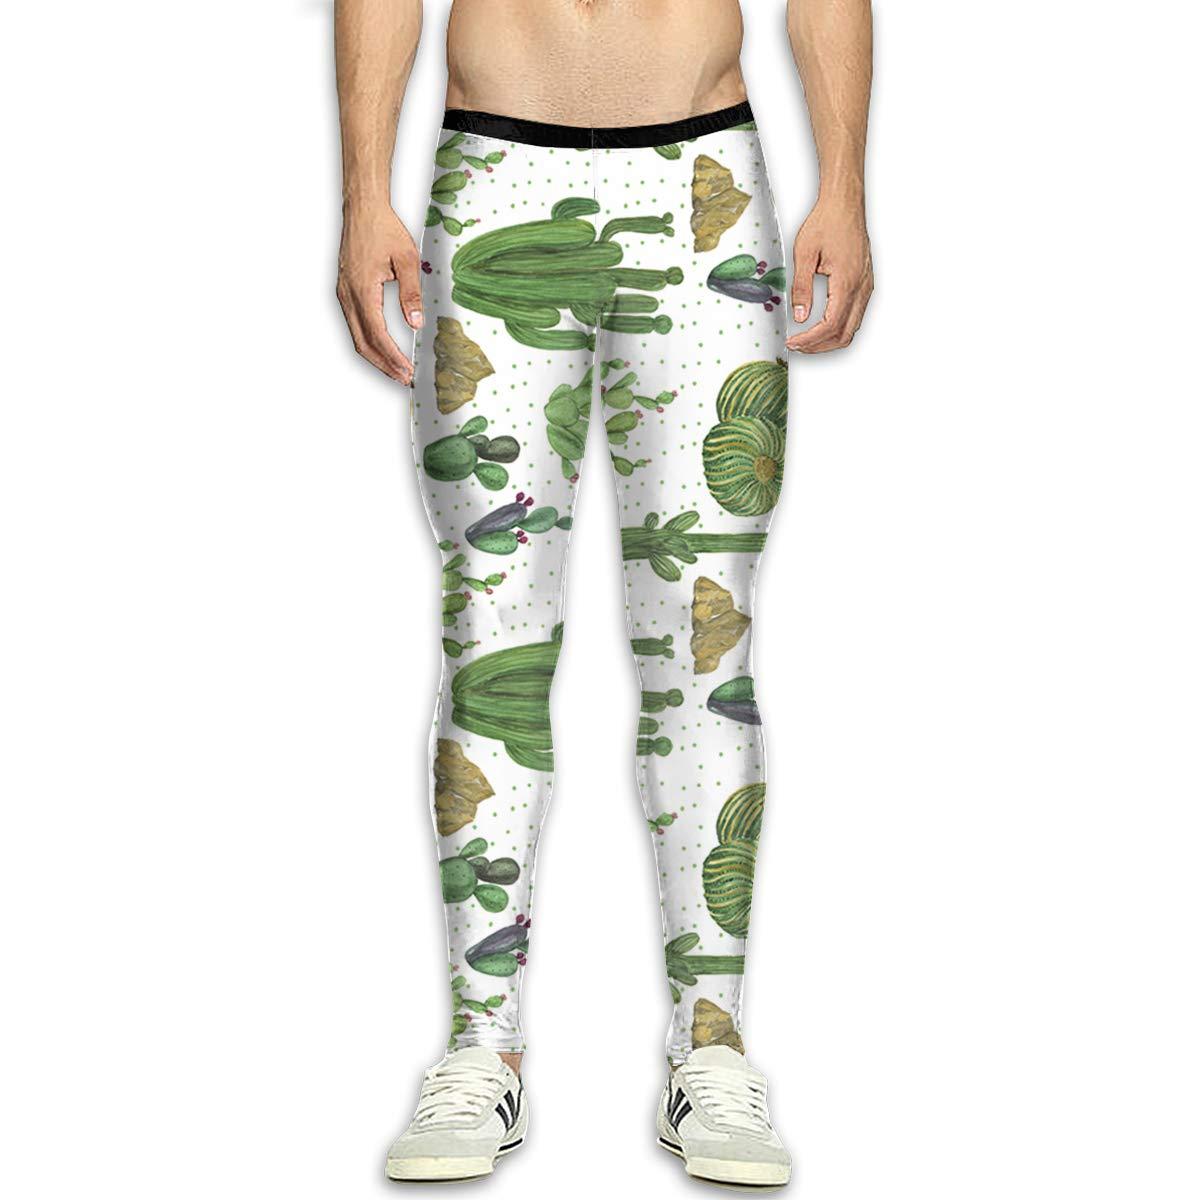 - - - Techdecorhomee Mens Compression Leggings Yoga Pants Desert Cactus Succulent Plants Watercolor Running Tights Shapewear Sports Trousers White 3b32fb